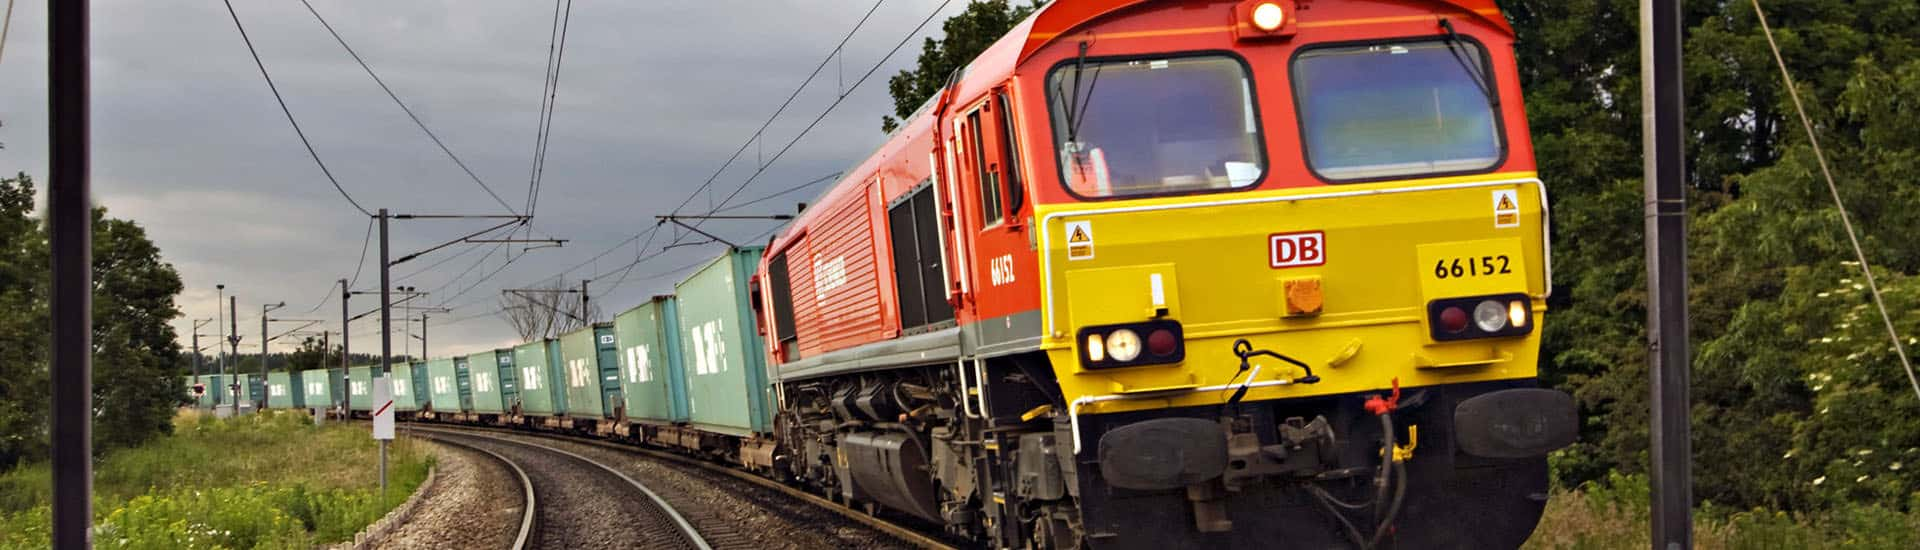 reil-freight